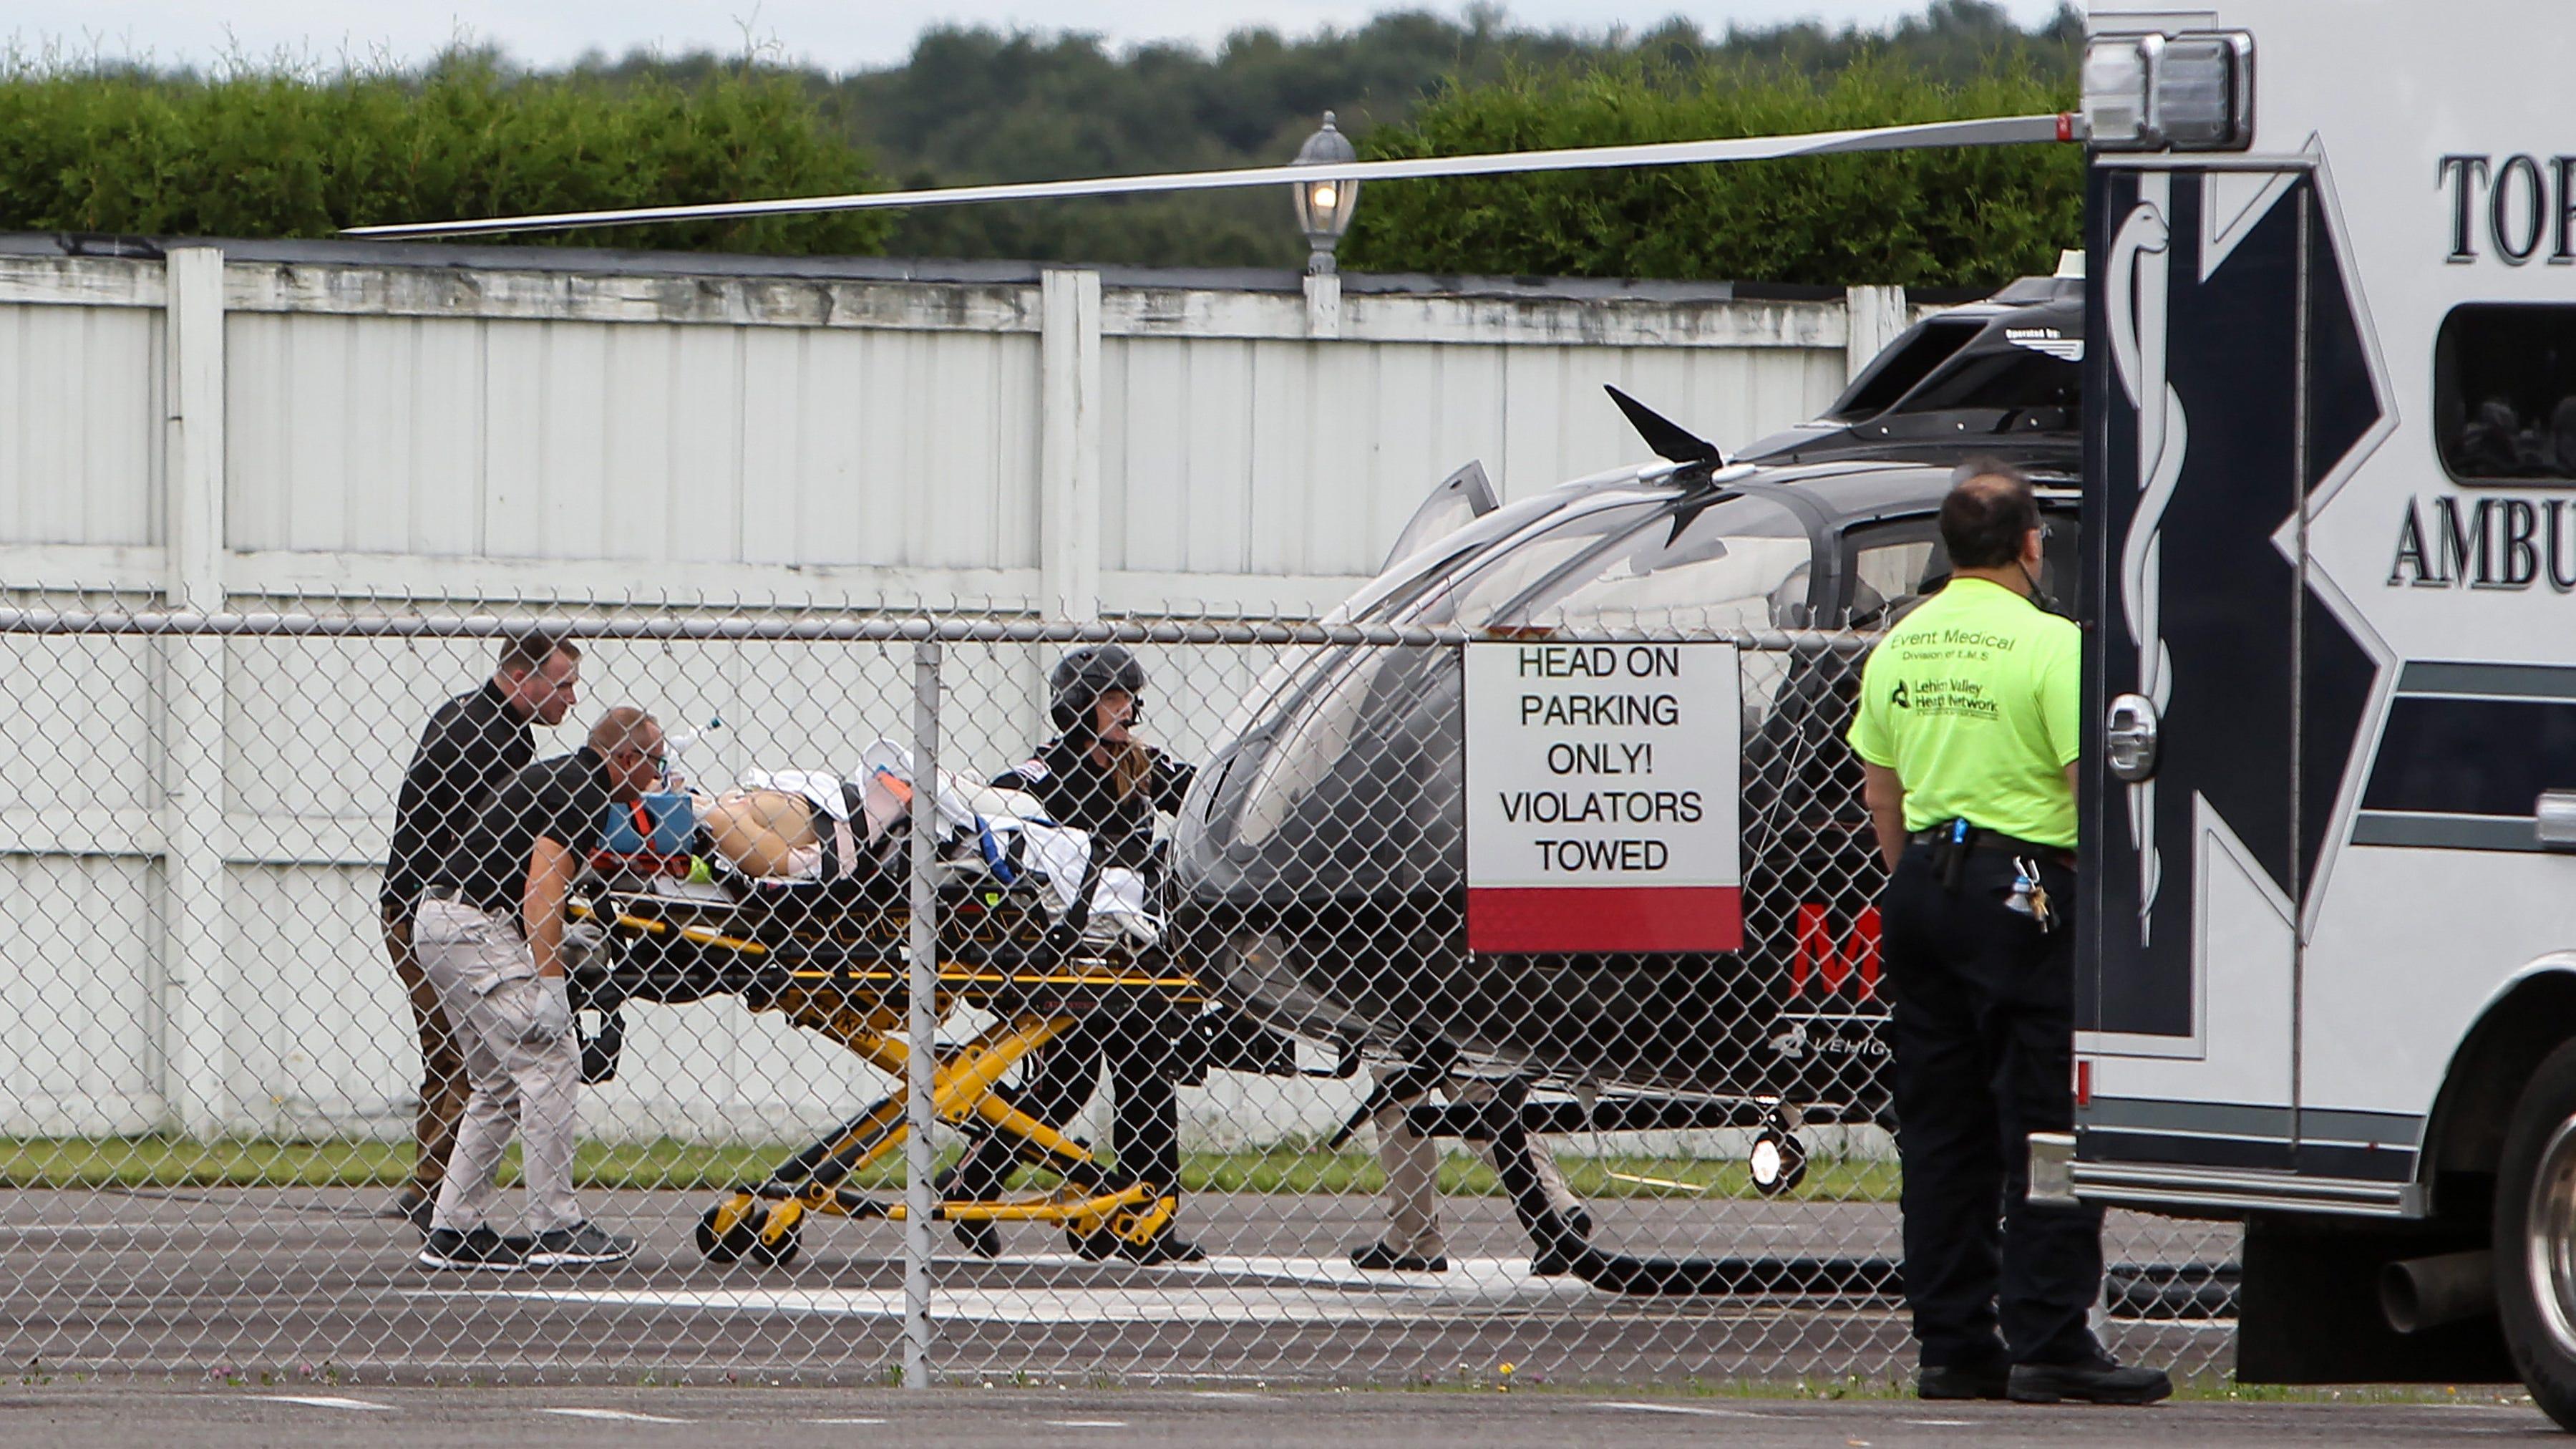 Robert Wickens' violent IndyCar crash casts cloud over Alexander Rossi's win at Pocono